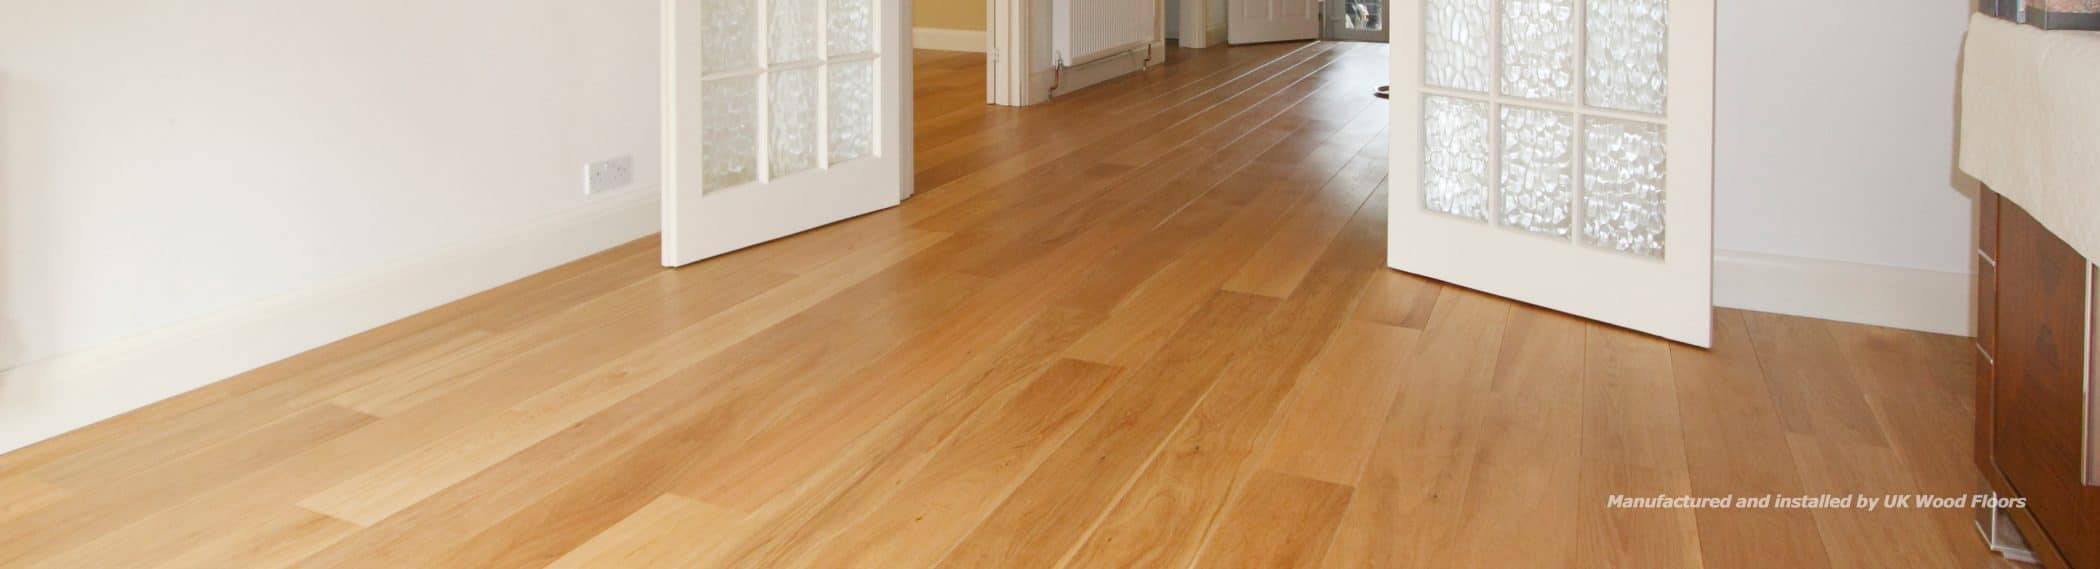 Oak Prime A B Grade Engineered Flooring Uk Wood Floors